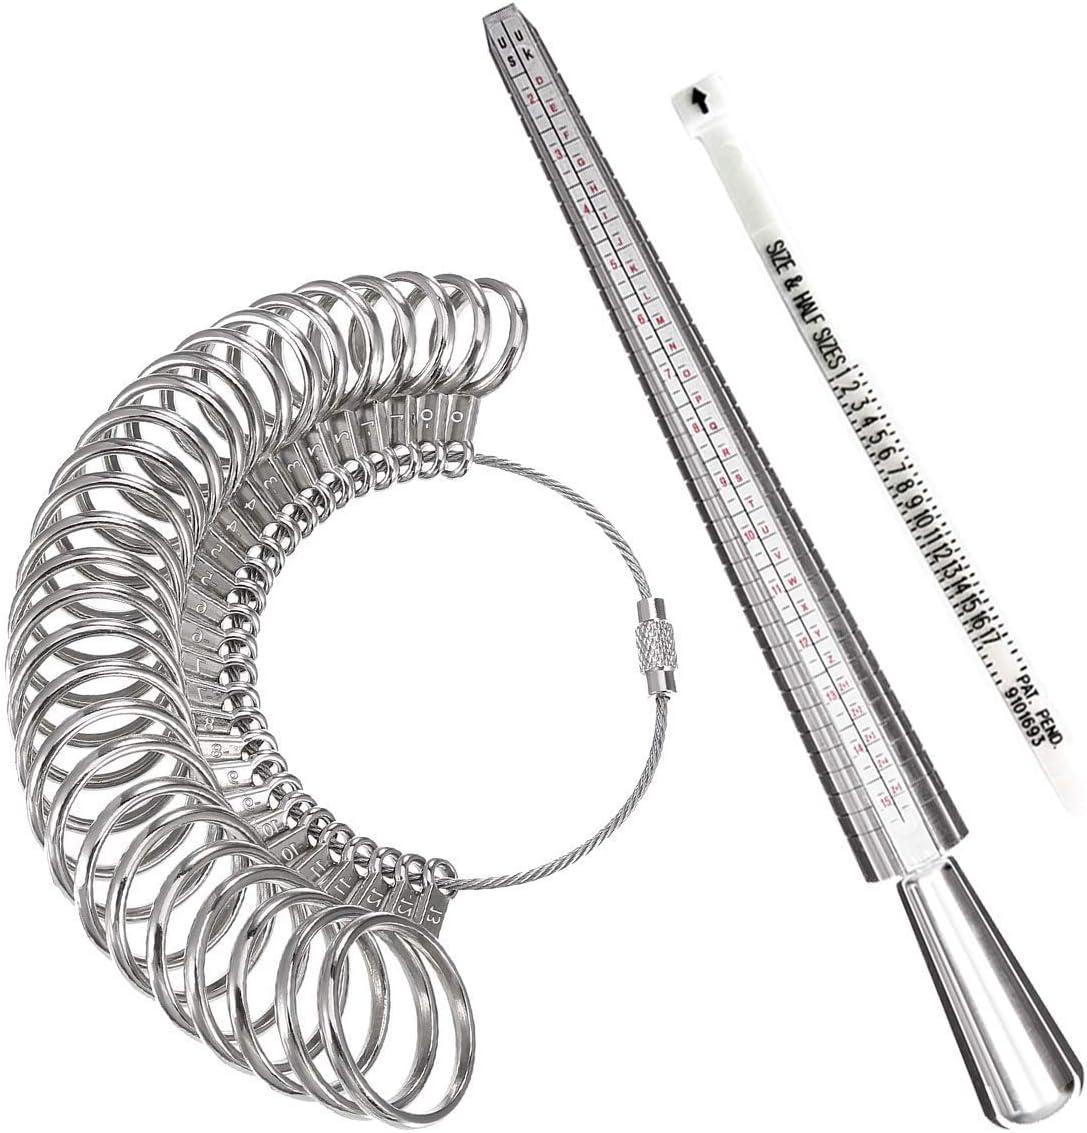 Ring Sizer Set Metal Mandrel Gauge Finger Size Measure Rings Sizing Measurement Tool Jewelry Making Tools Jewelers Loop US 0-13